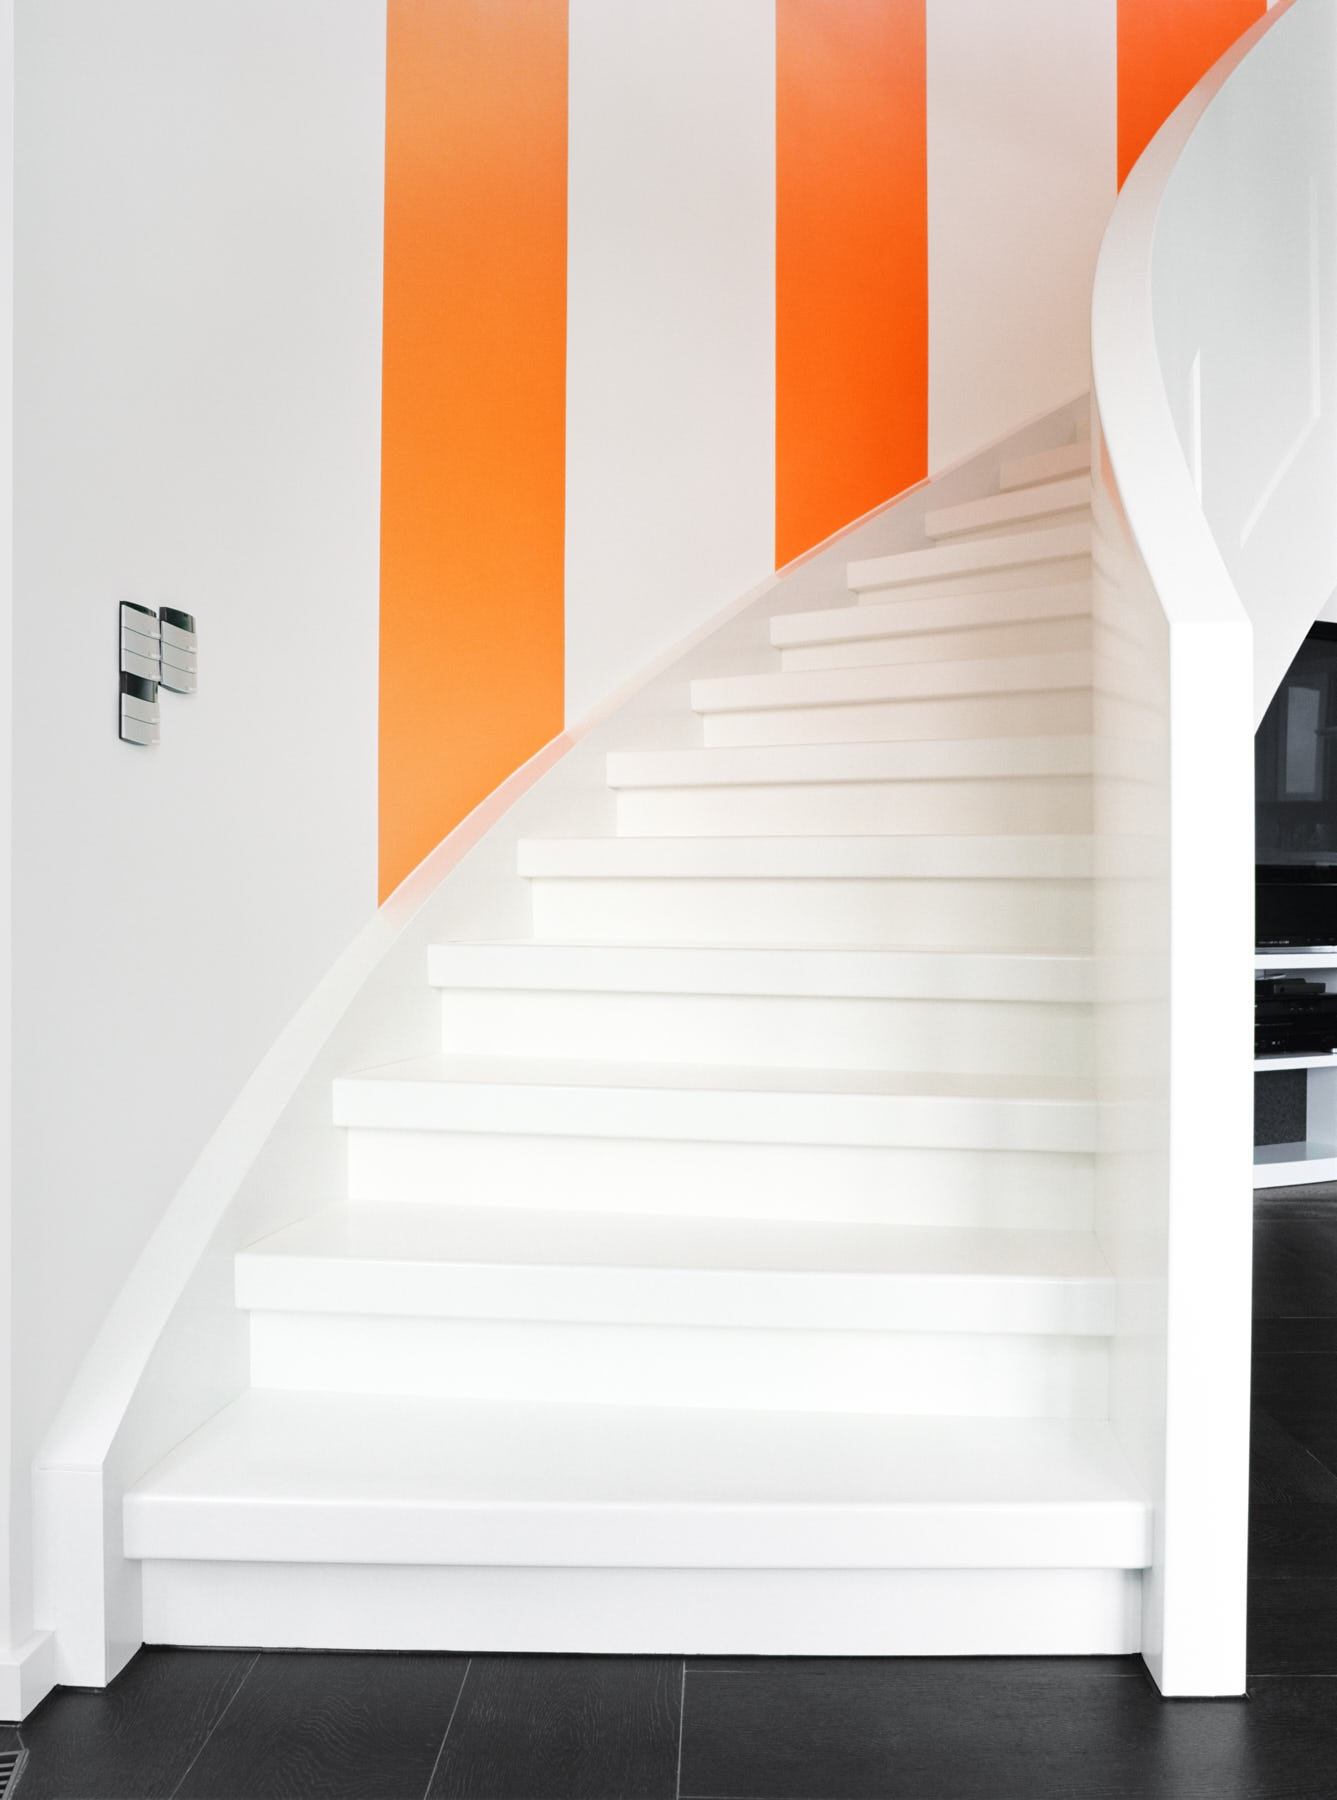 wei e treppe mit klaren formen daniel beutler treppenbau. Black Bedroom Furniture Sets. Home Design Ideas